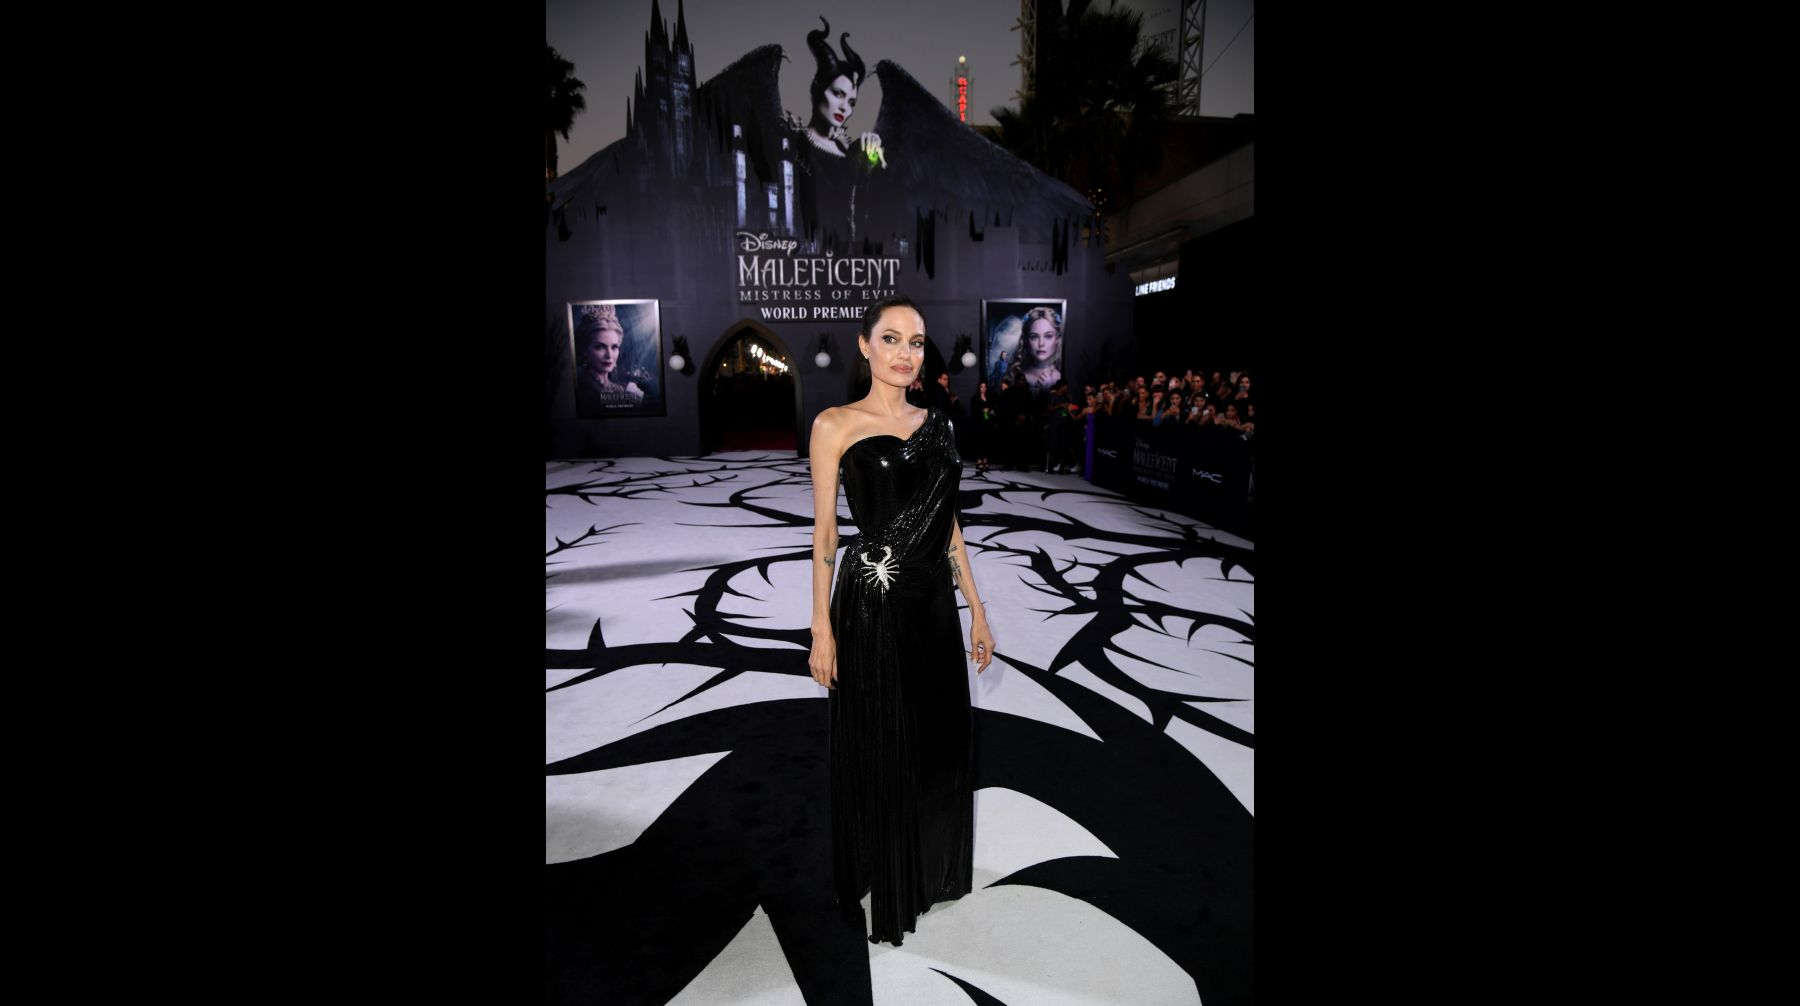 Malefica 2 Angelina Jolie Y Elle Fanning Deslumbran En